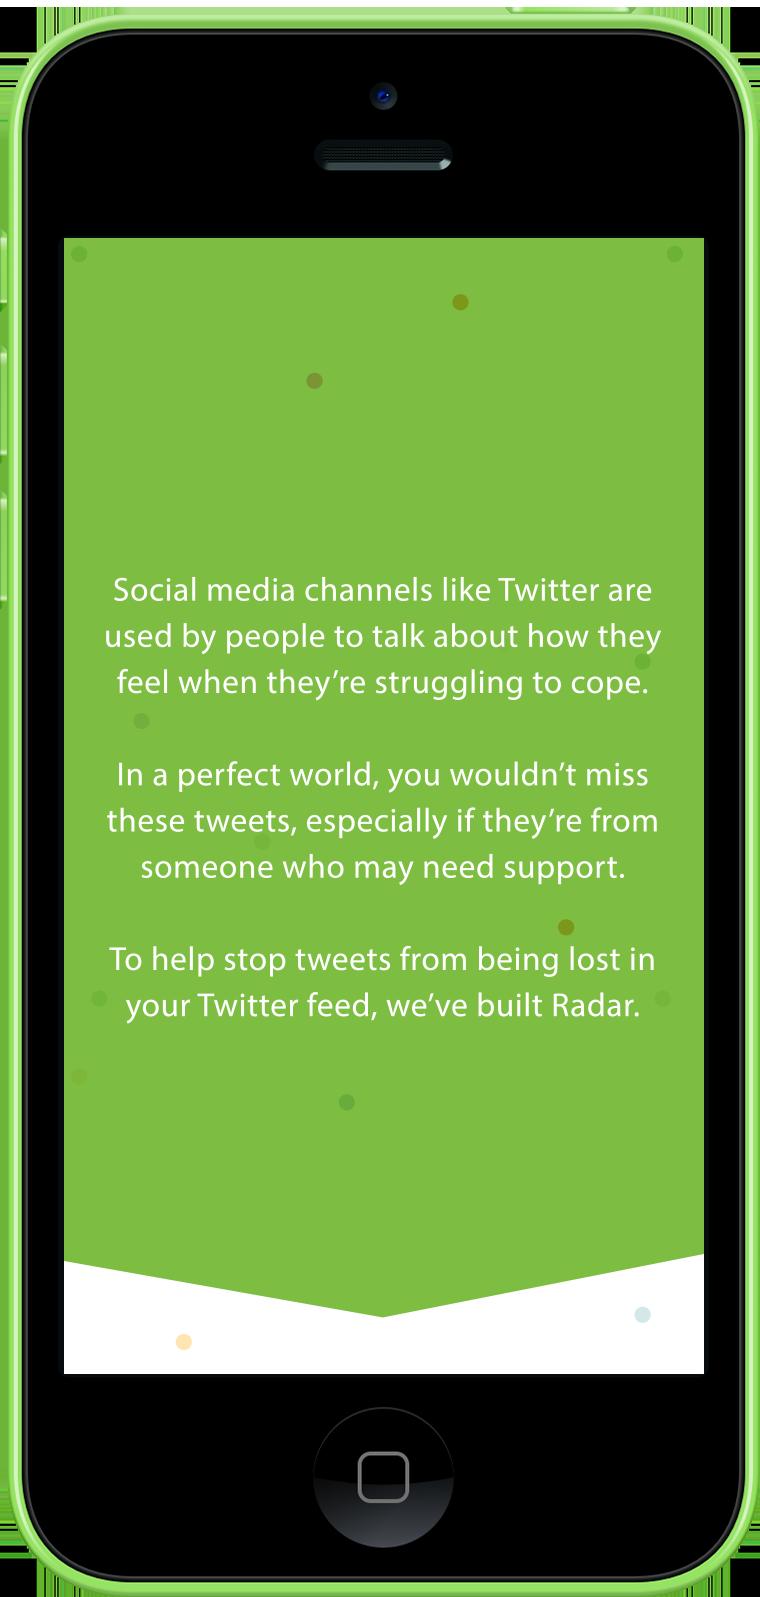 radar-04